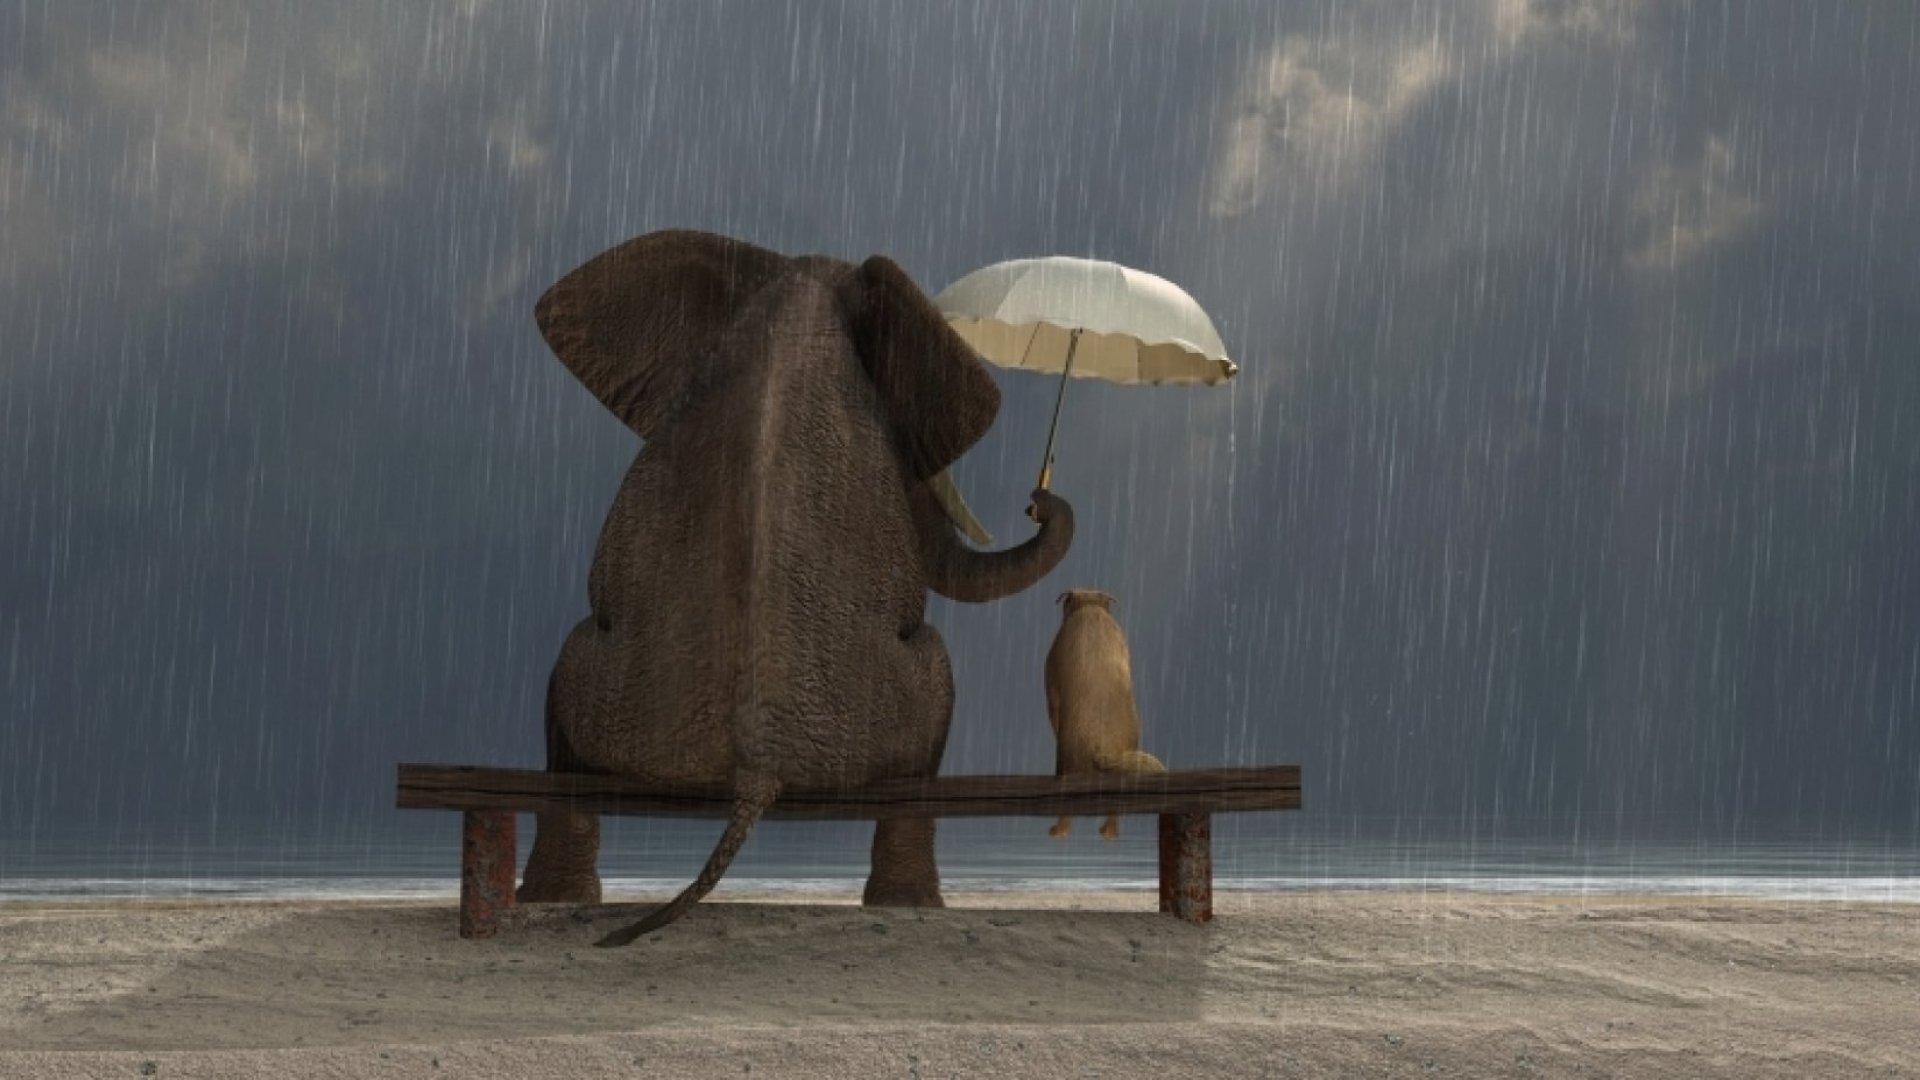 7 Super Effective Ways to Make Kindness a Habit